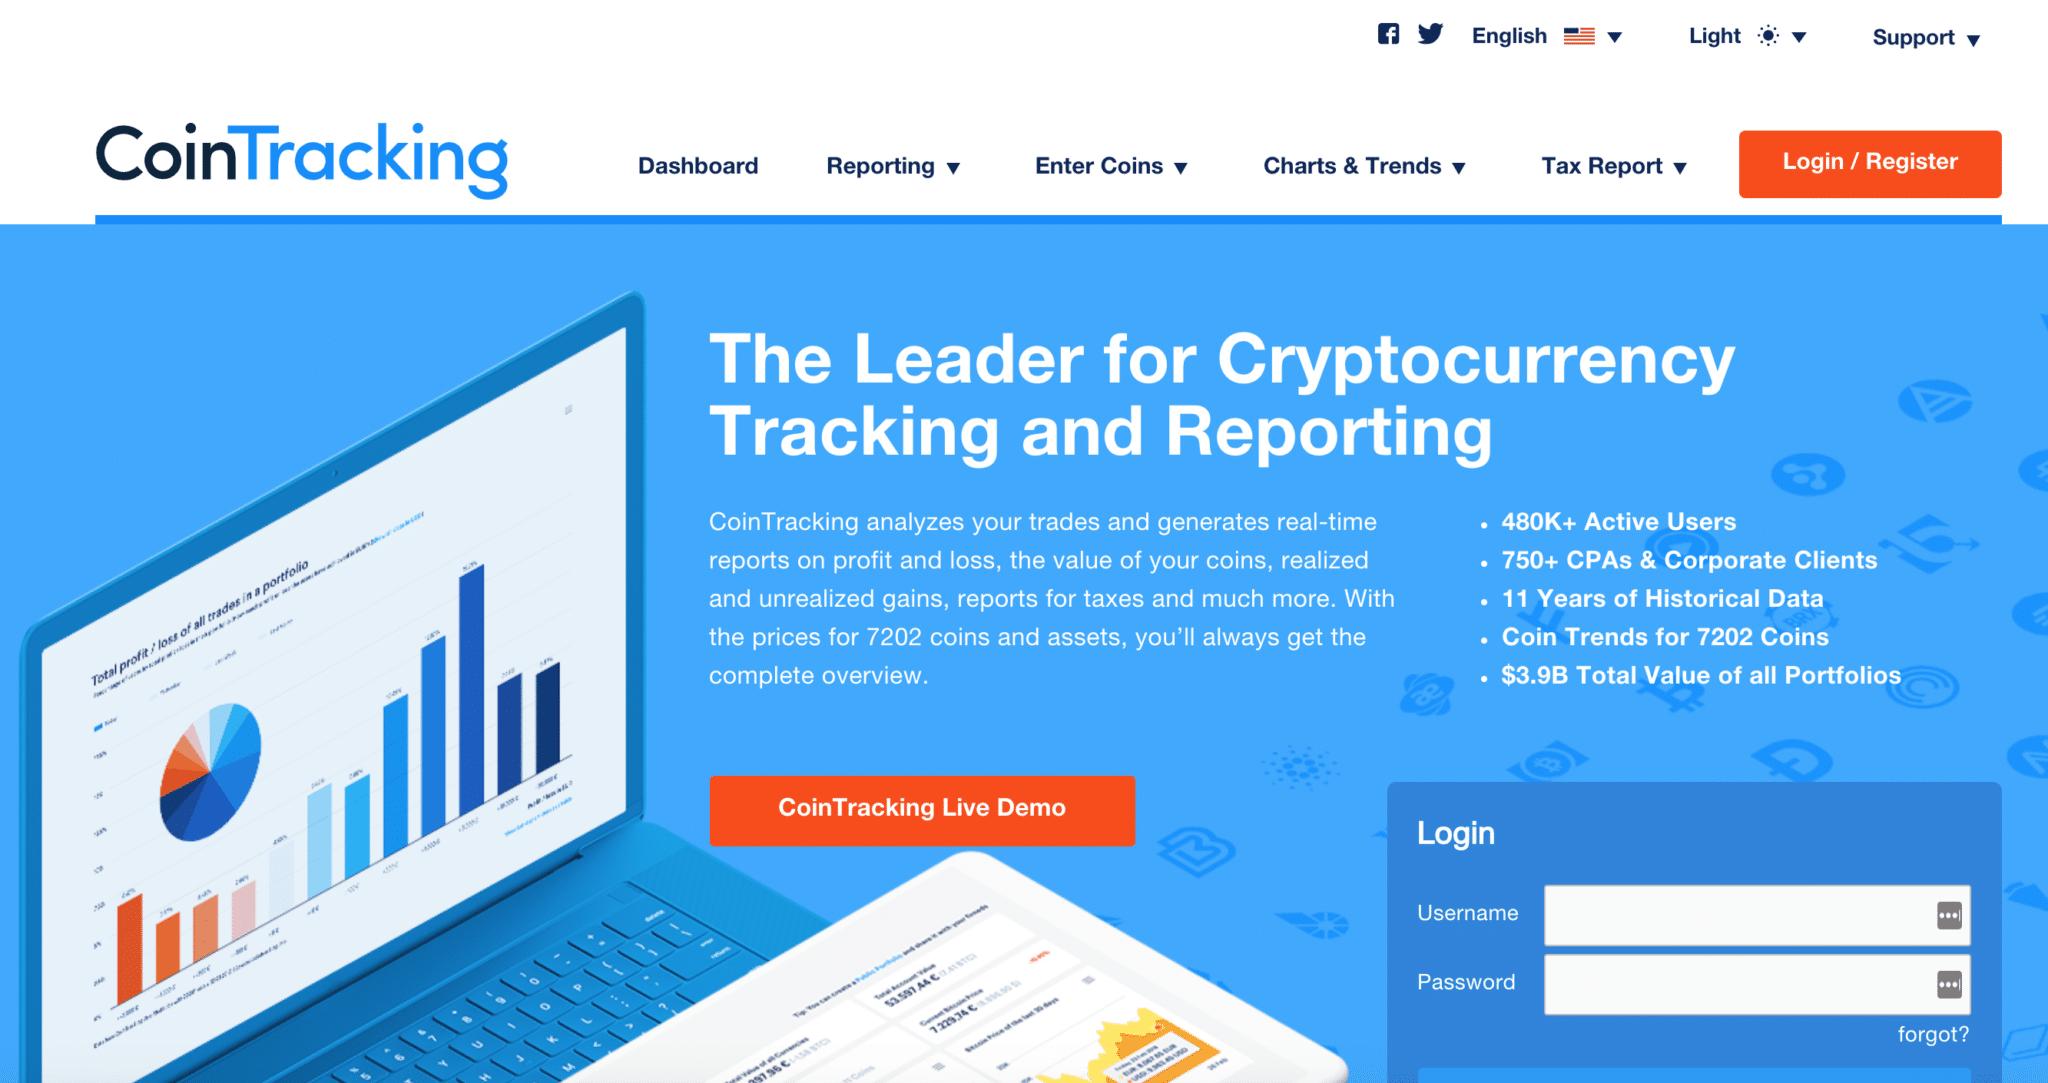 Top Cryptocurrency Affiliate Programs: My 10 Favorites | Nextlevel Ventures 2021